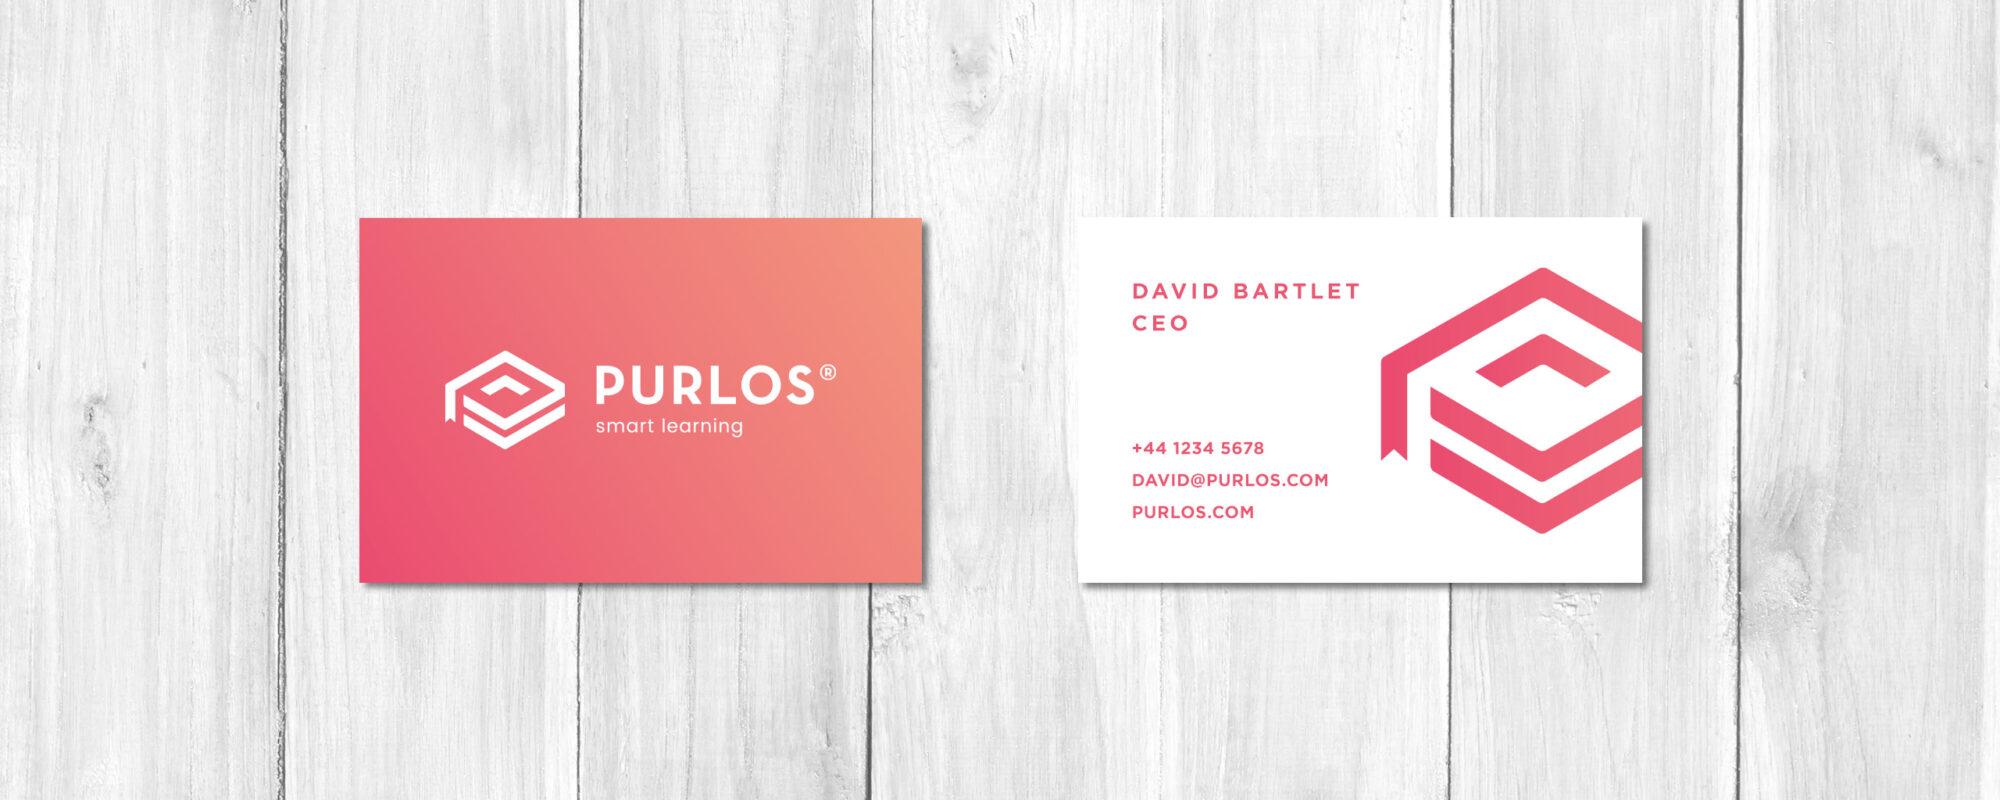 Purlos Business Card Design